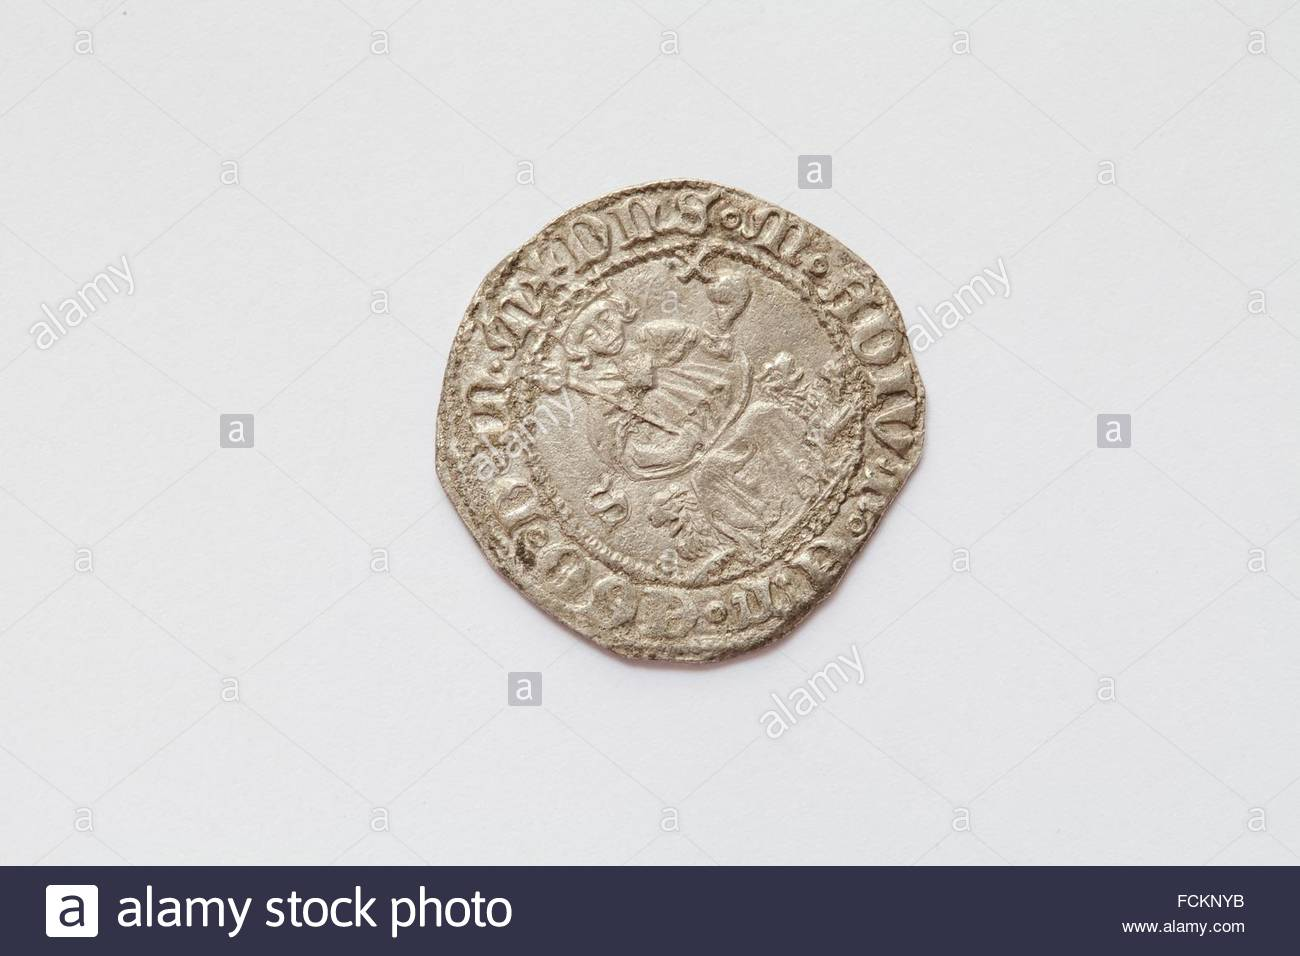 Naples Kingdom, Carlino, Ancient Coin. - Stock Image